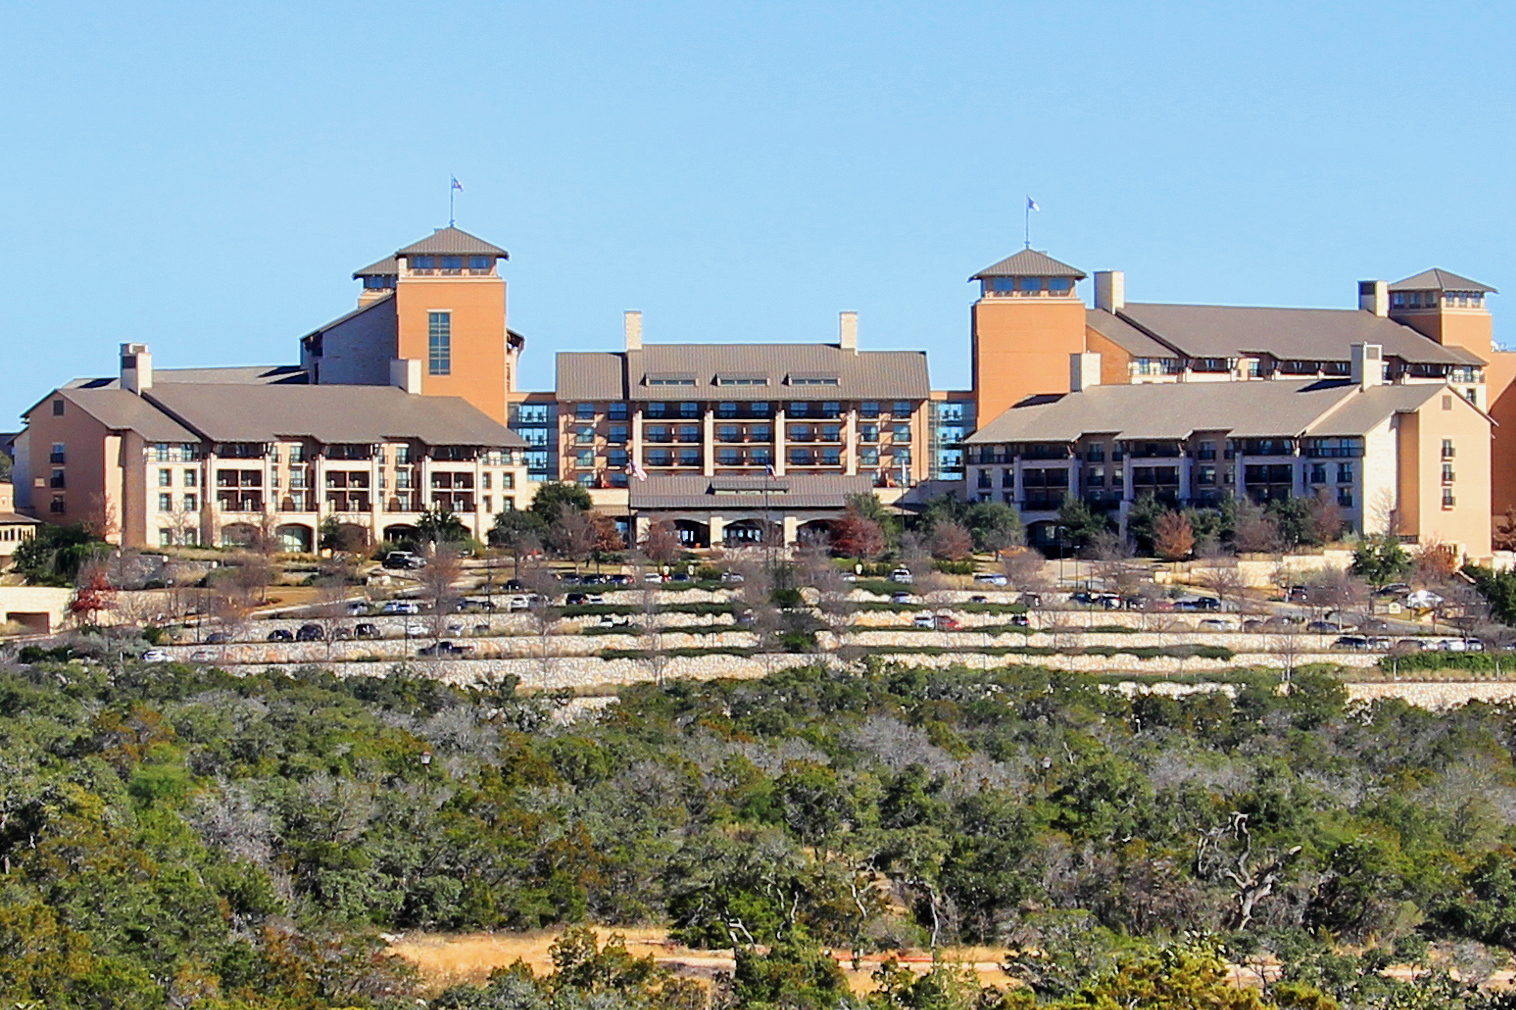 Jw Marriott San Antonio Resort And Spa